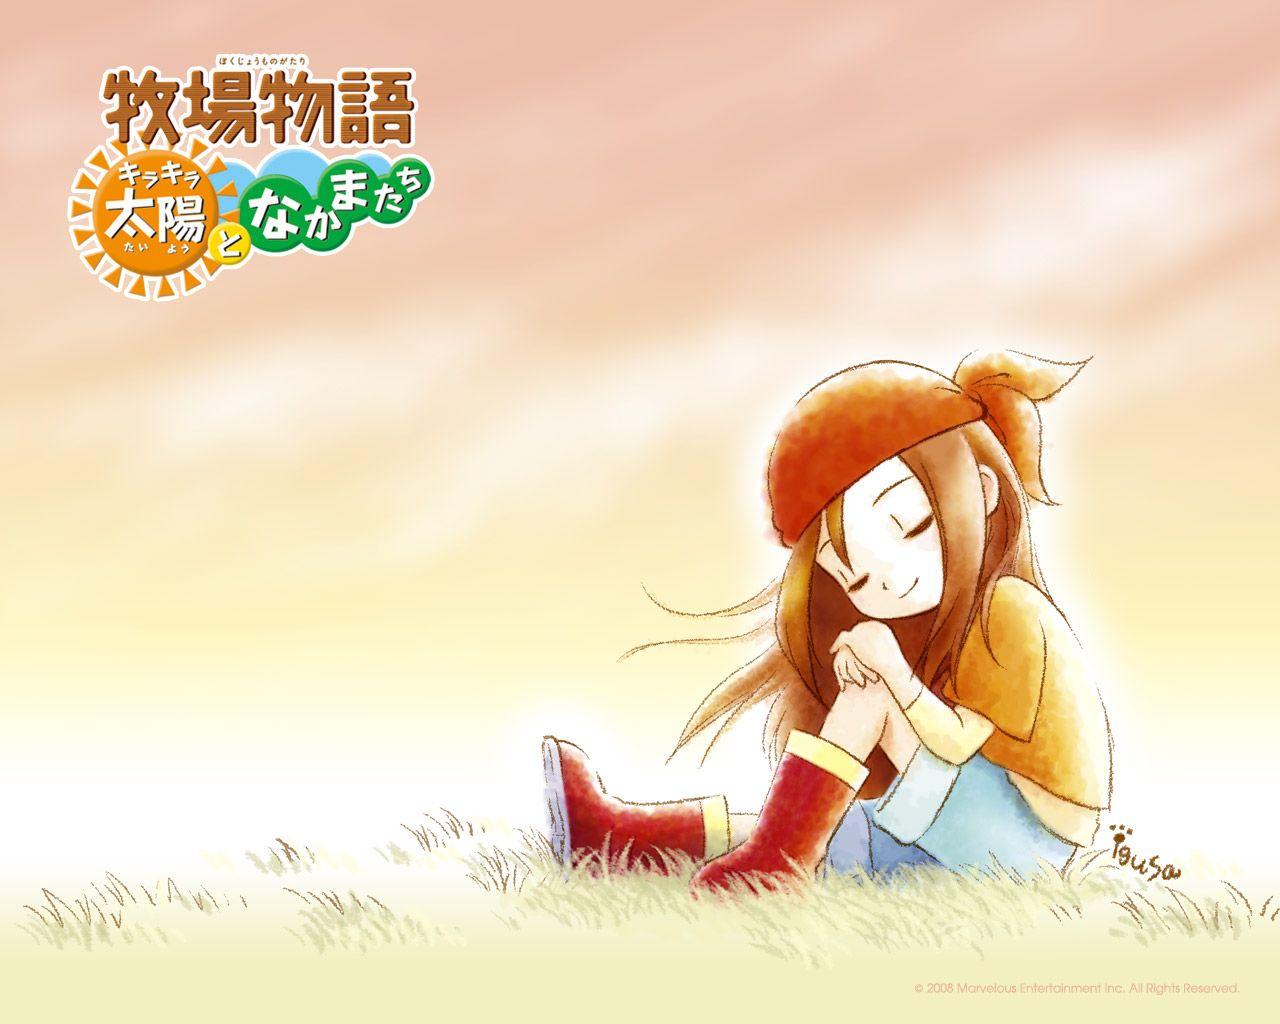 Ah peaceful days, Harvest Moon Island of Happiness